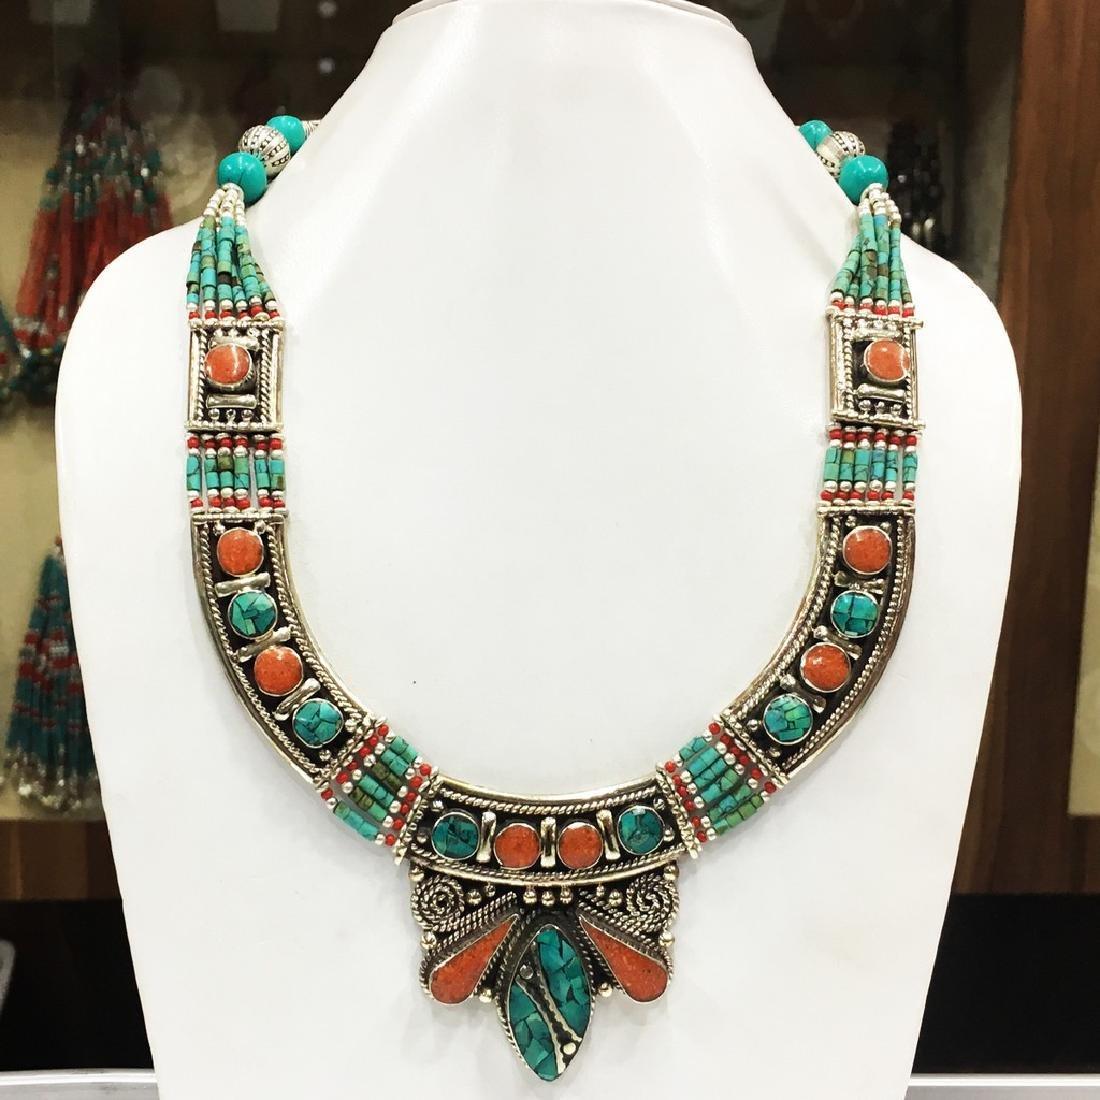 Tibetan & Nepalese Tibetan Silver Turquoise Necklace